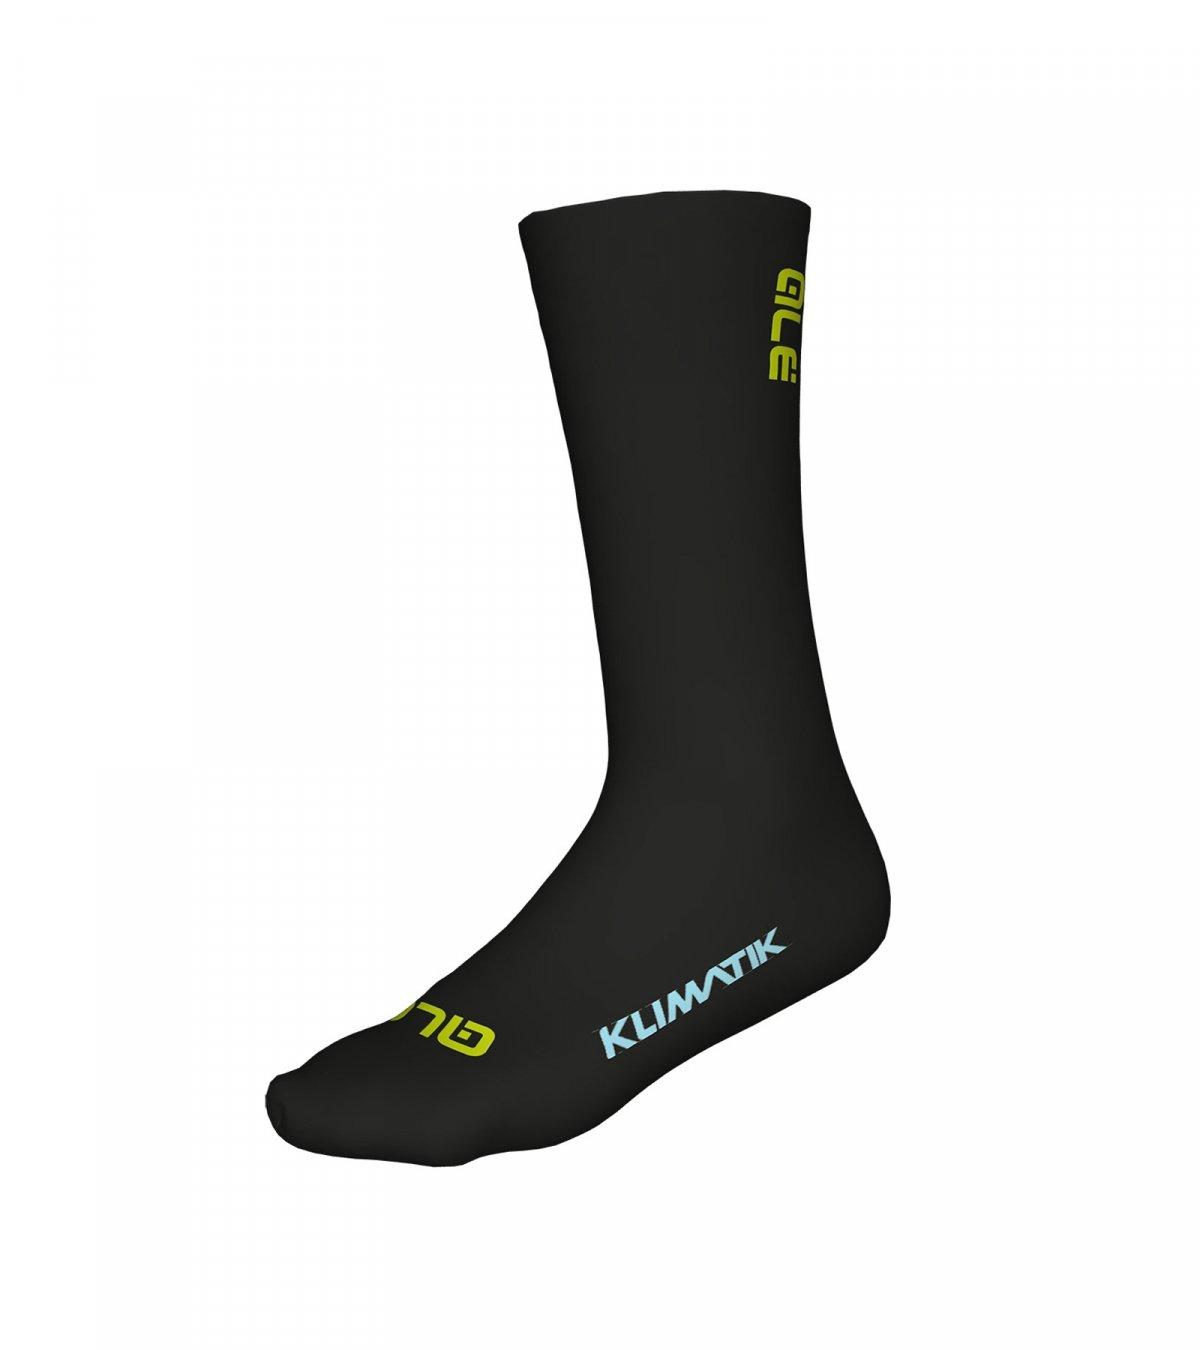 L09140118-team-klimatik-black-socks_1200_1350